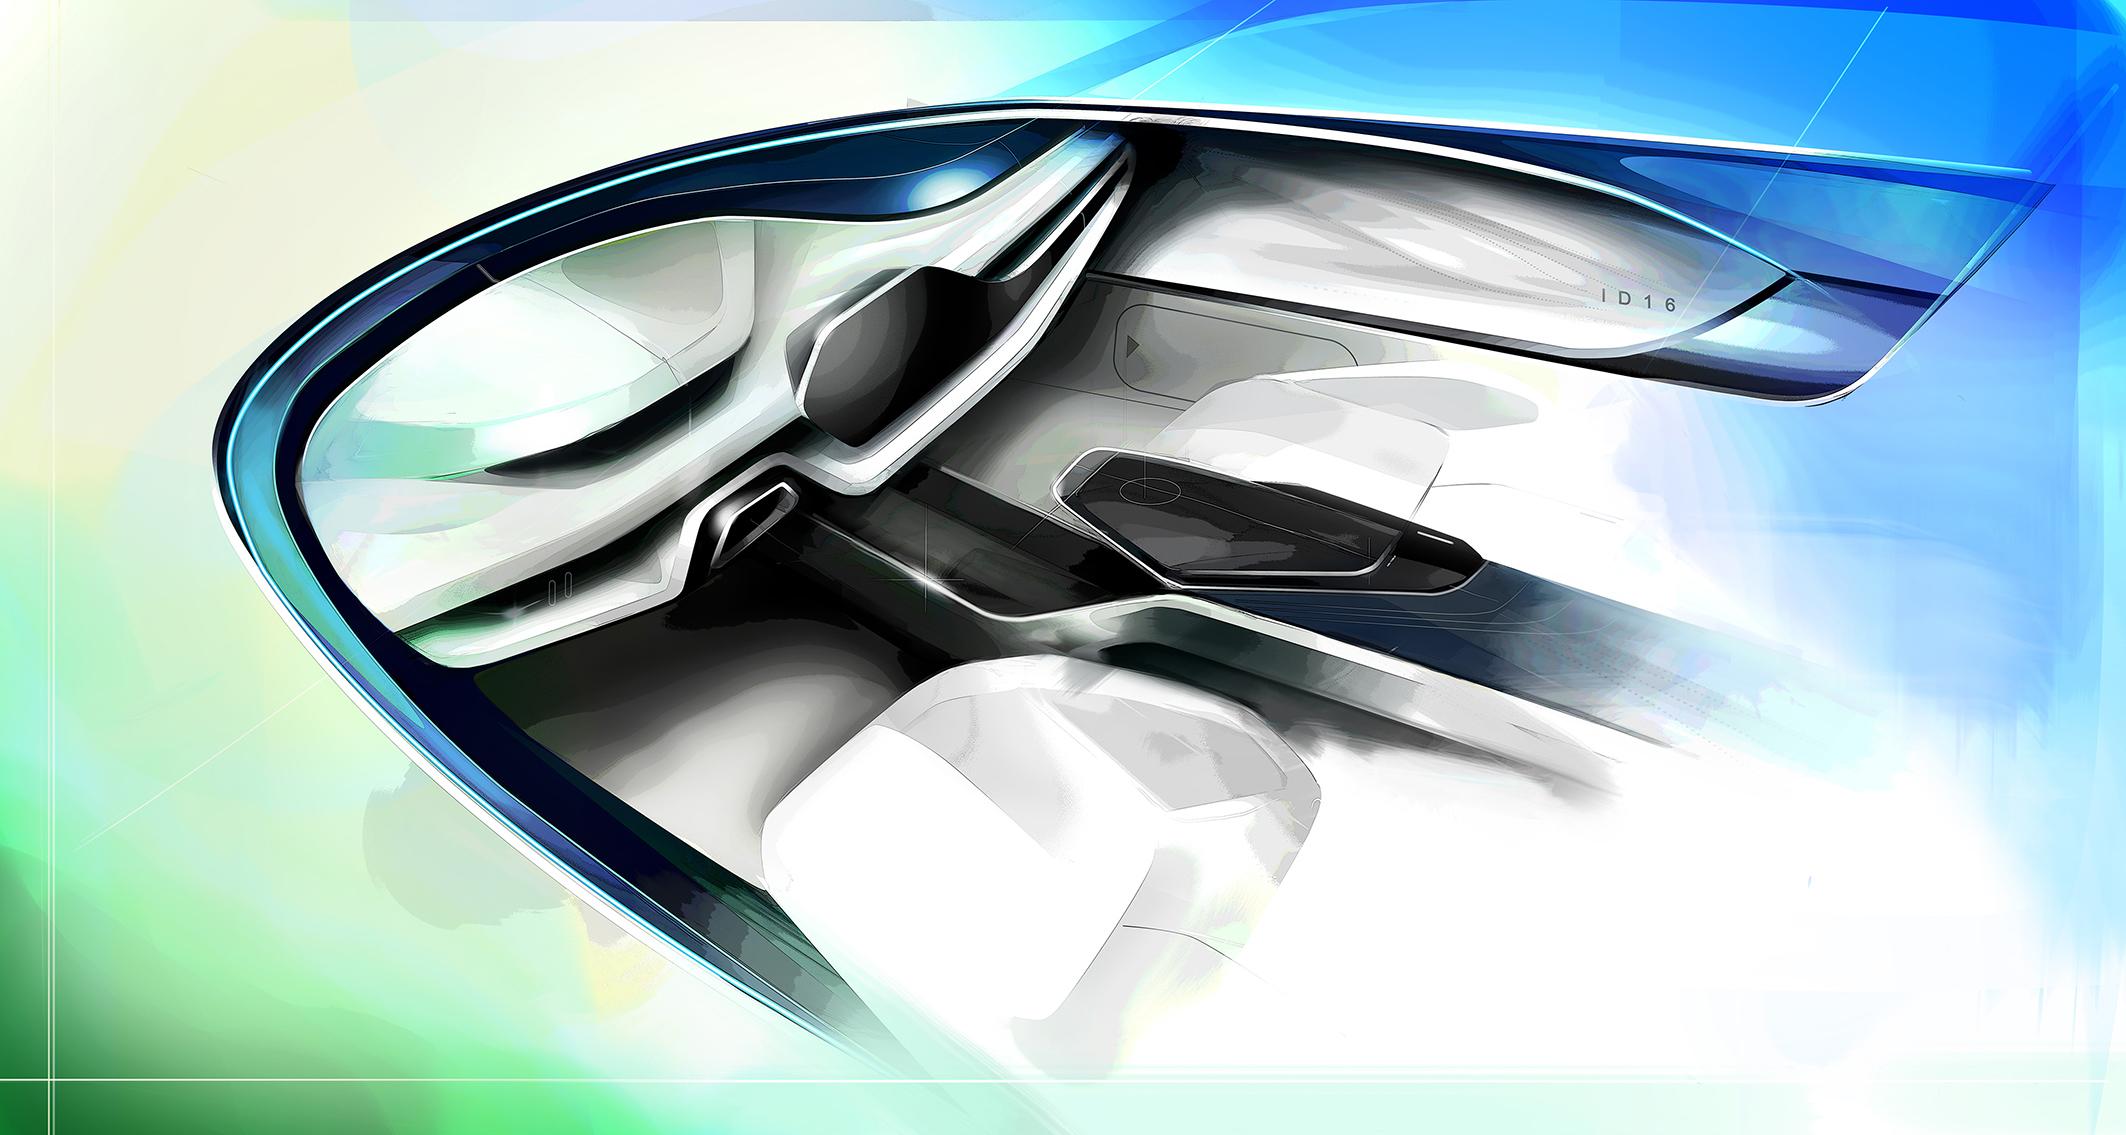 Yanfeng Automotive Interiors Zeigt Den Fahrzeuginnenraum Der Zukunft Neues Konzeptfahrzeug Id